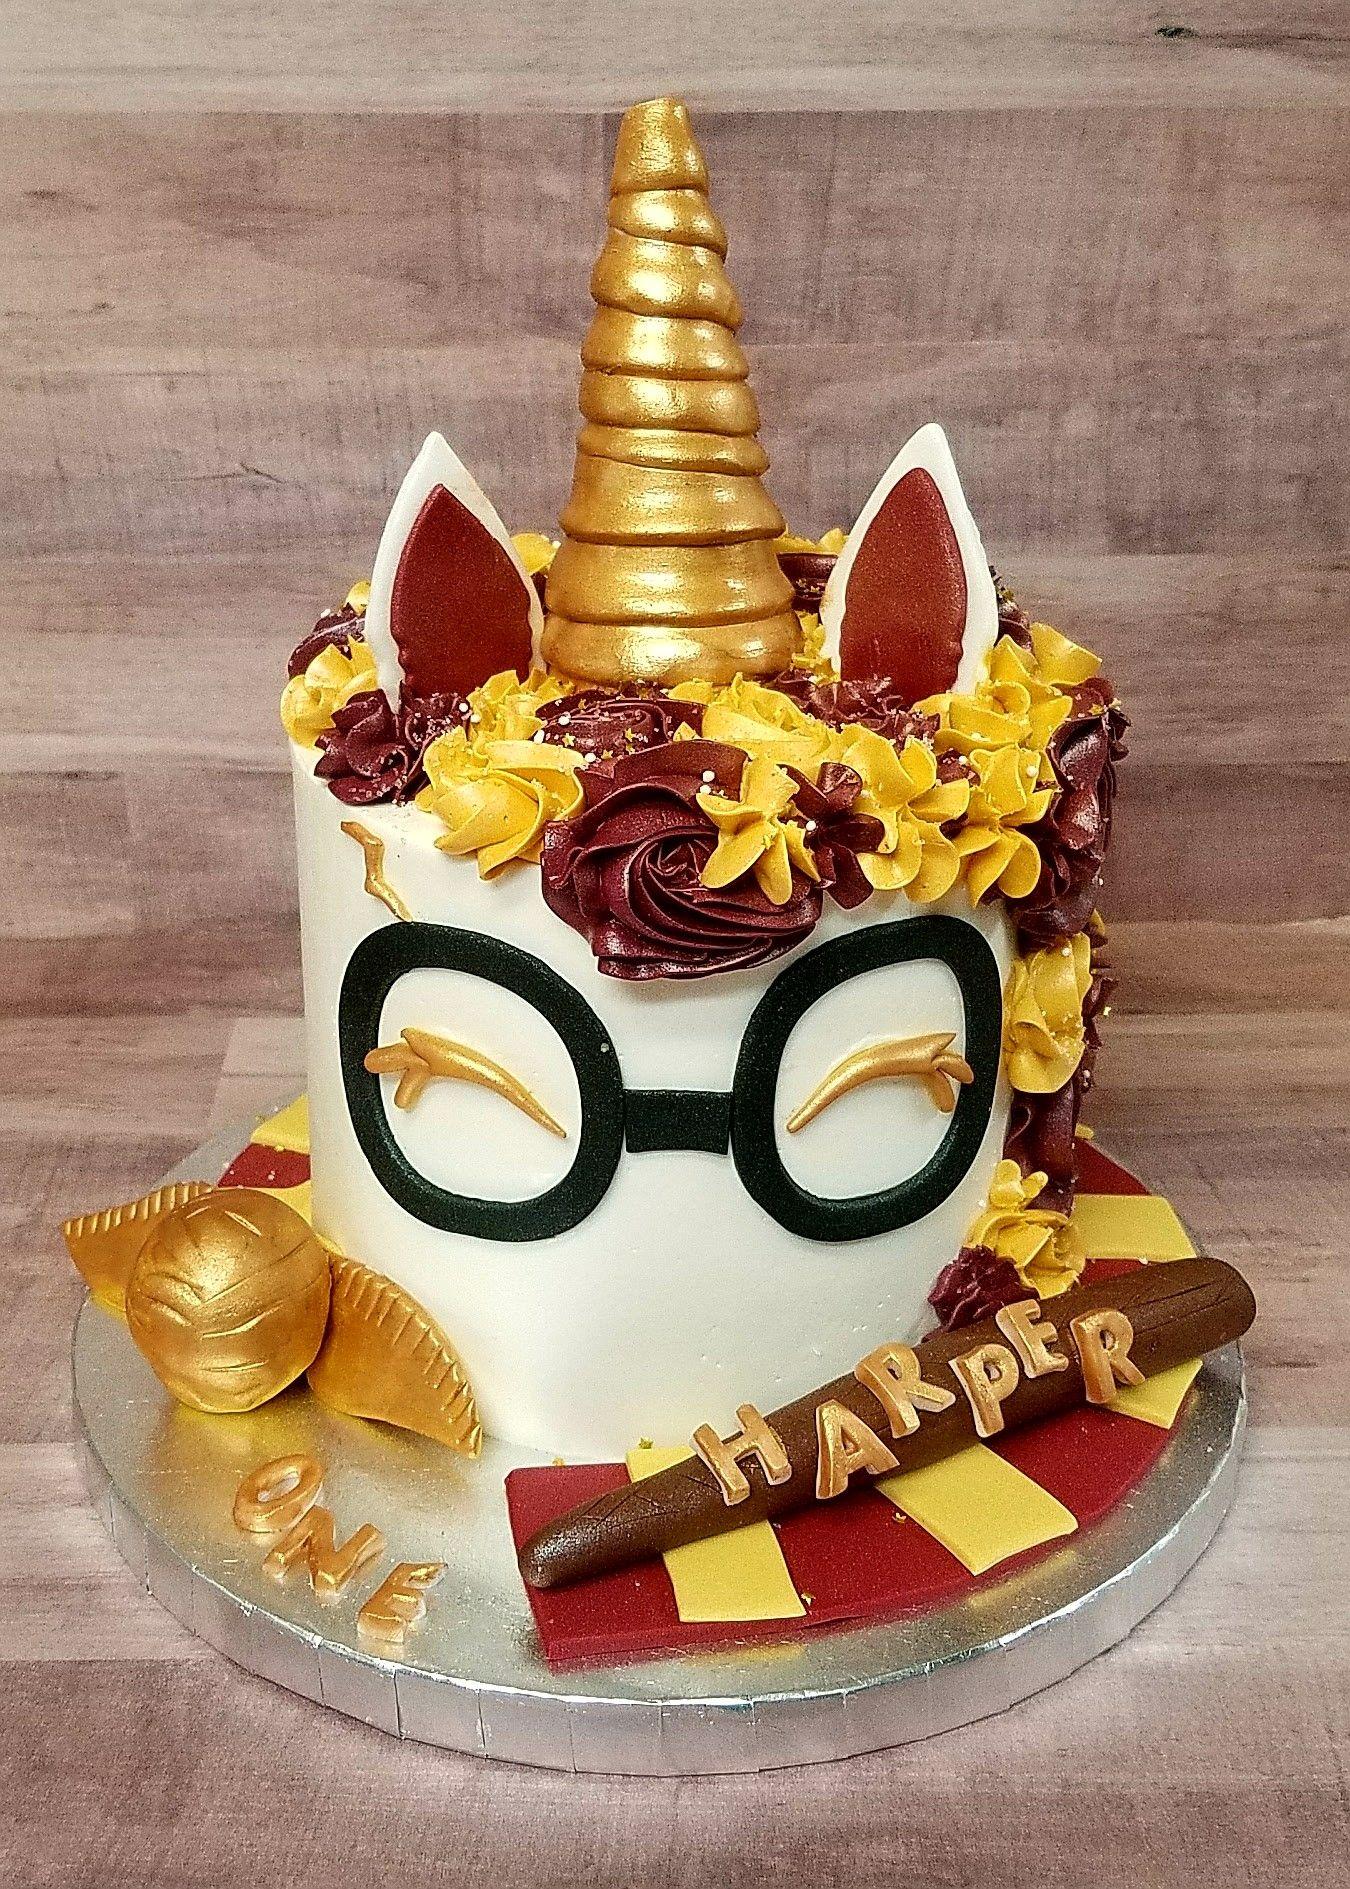 Harry Potter Unicorn Smash Cake Pastry Bag Cake Co Llc Cakes In